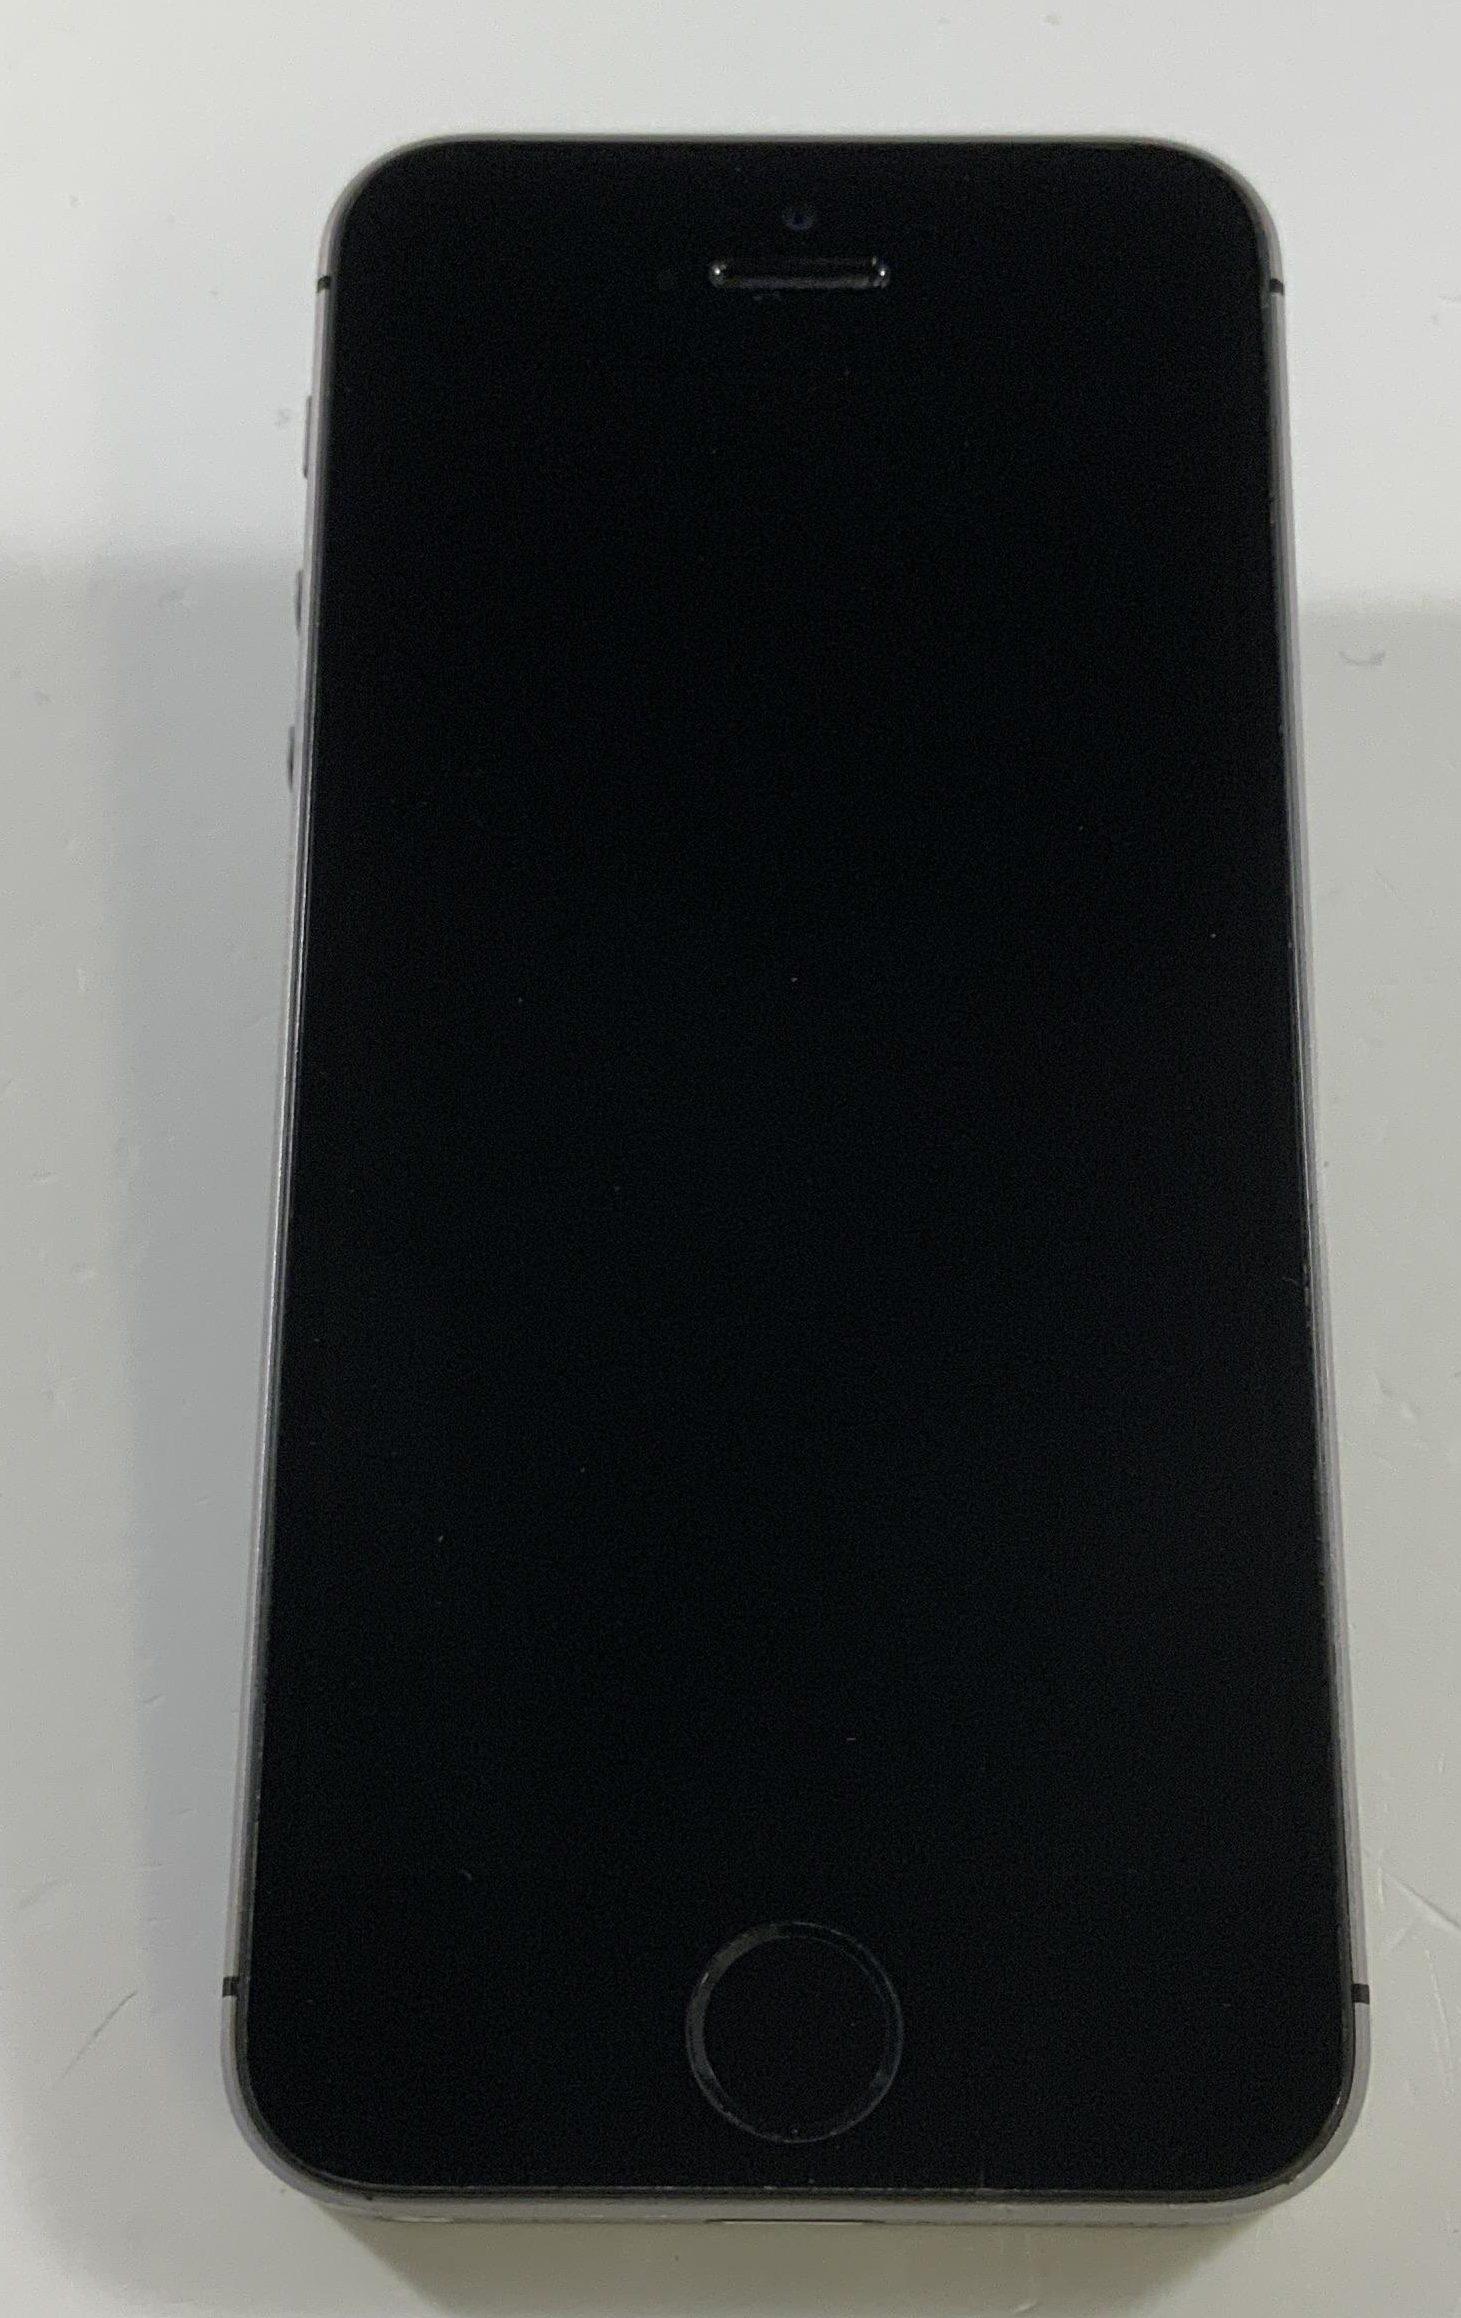 iPhone SE 128GB, 128GB, Space Gray, bild 1